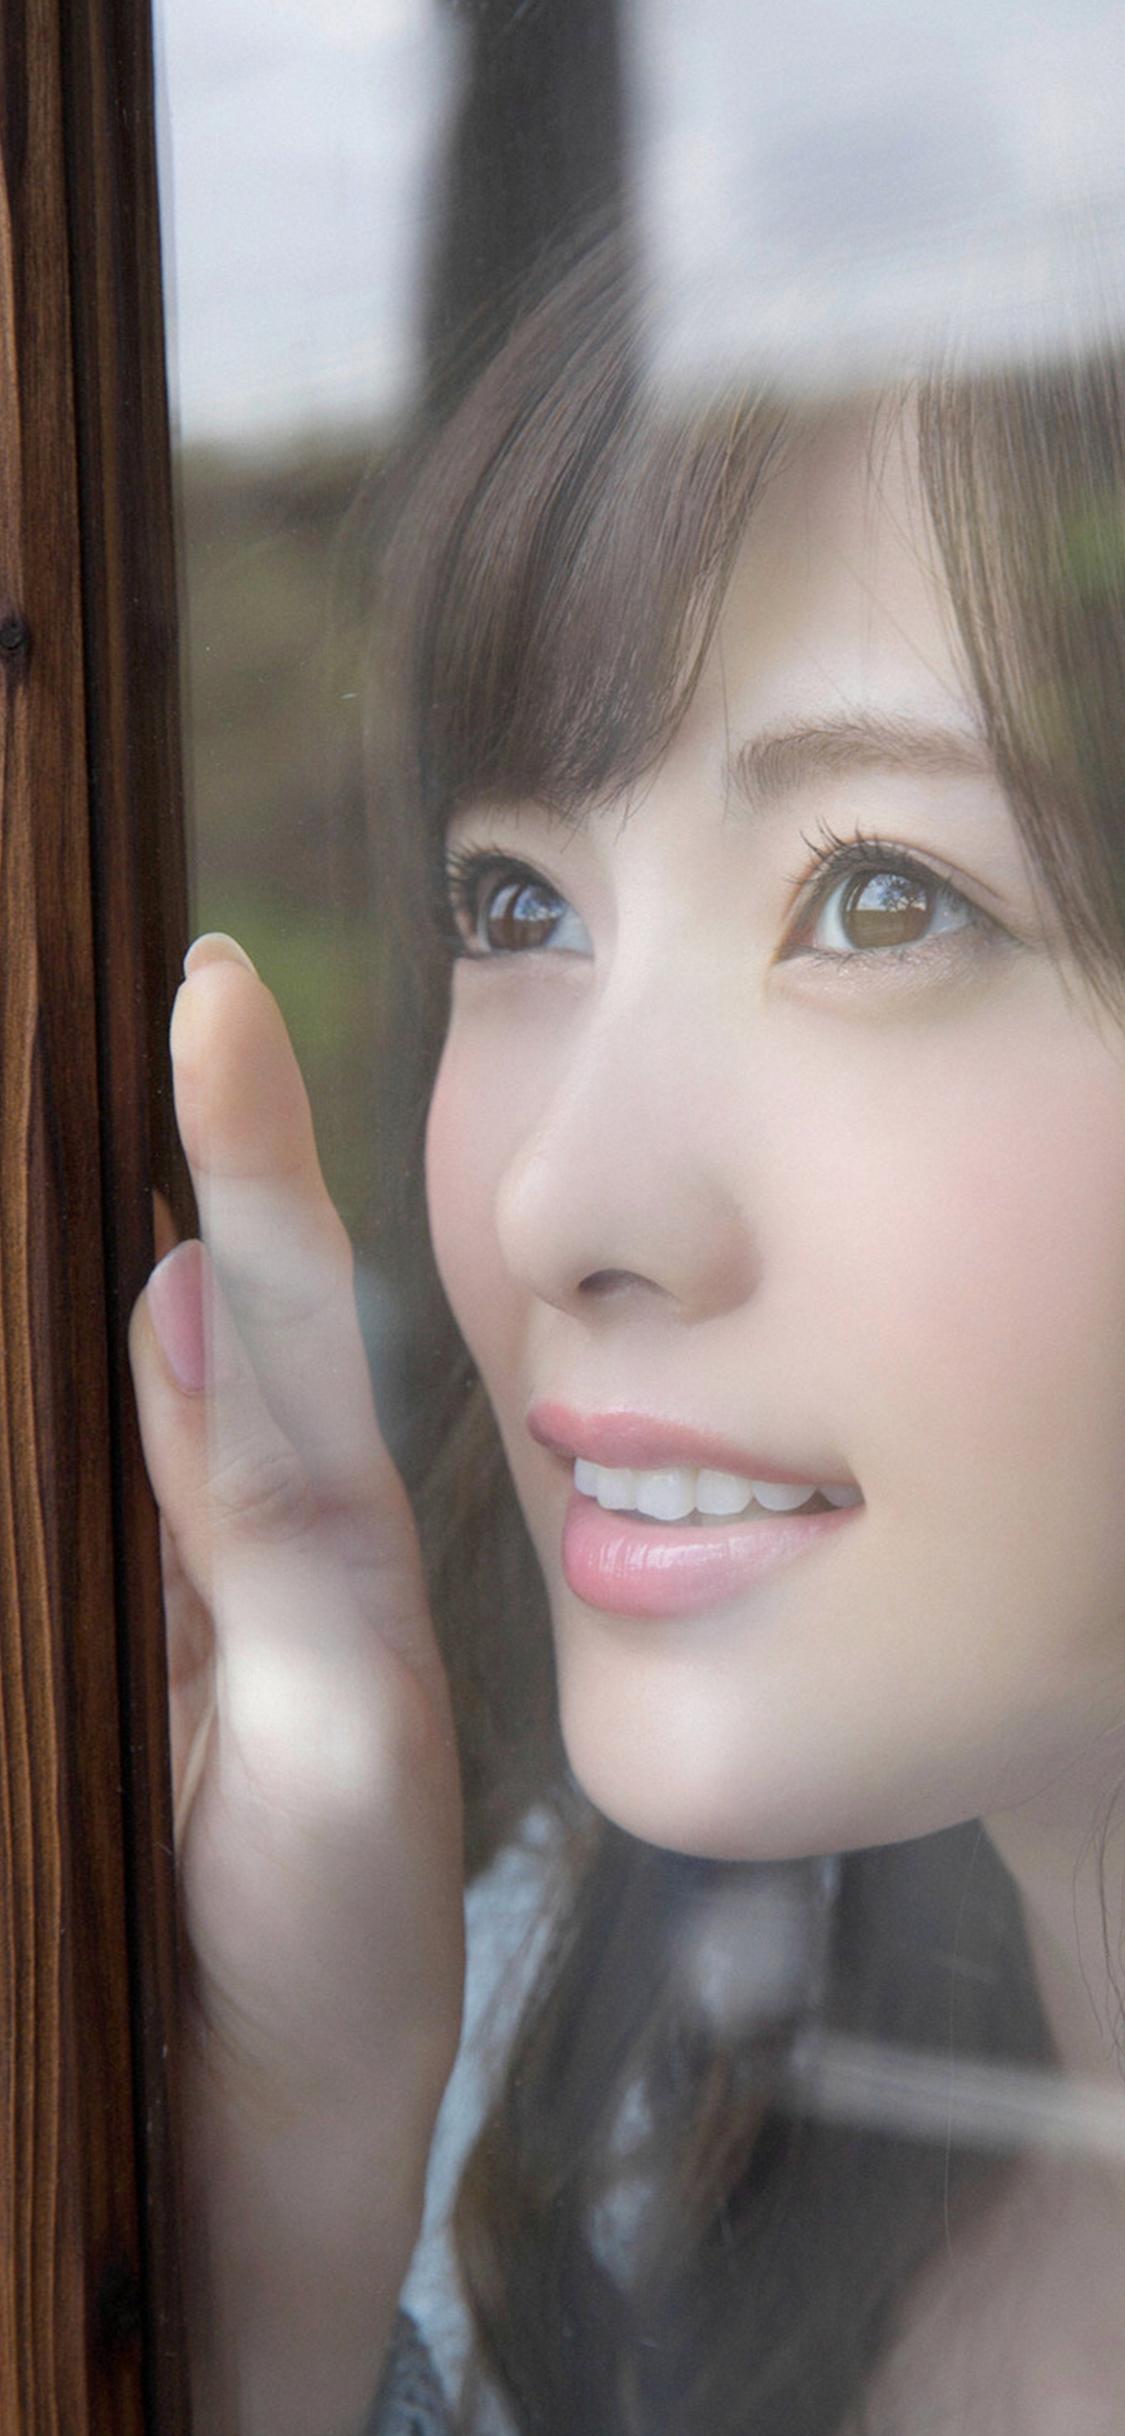 iphone_2436x1125_siraisimai_5